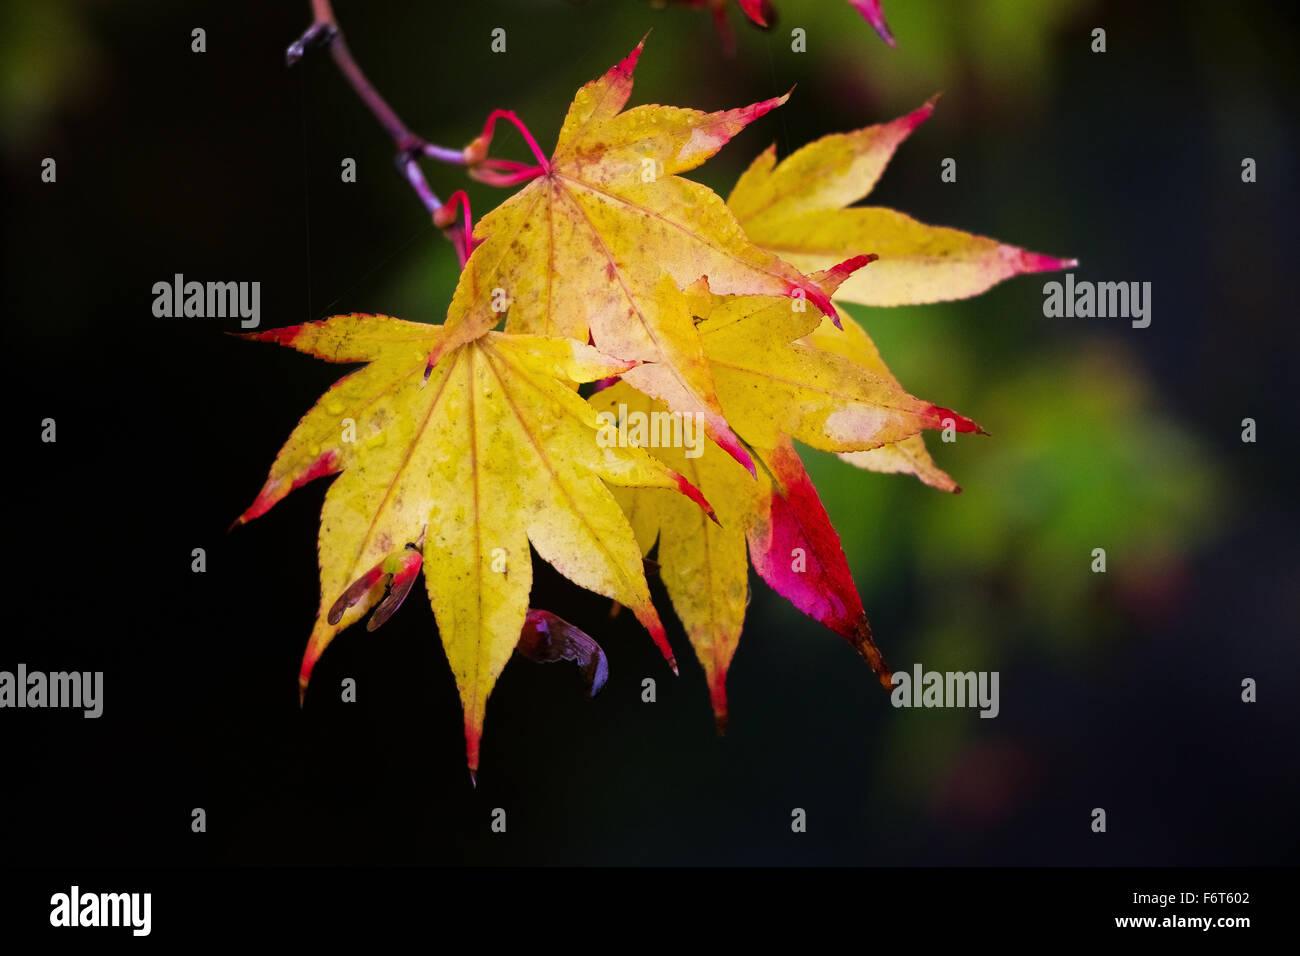 Leaf - Stock Image